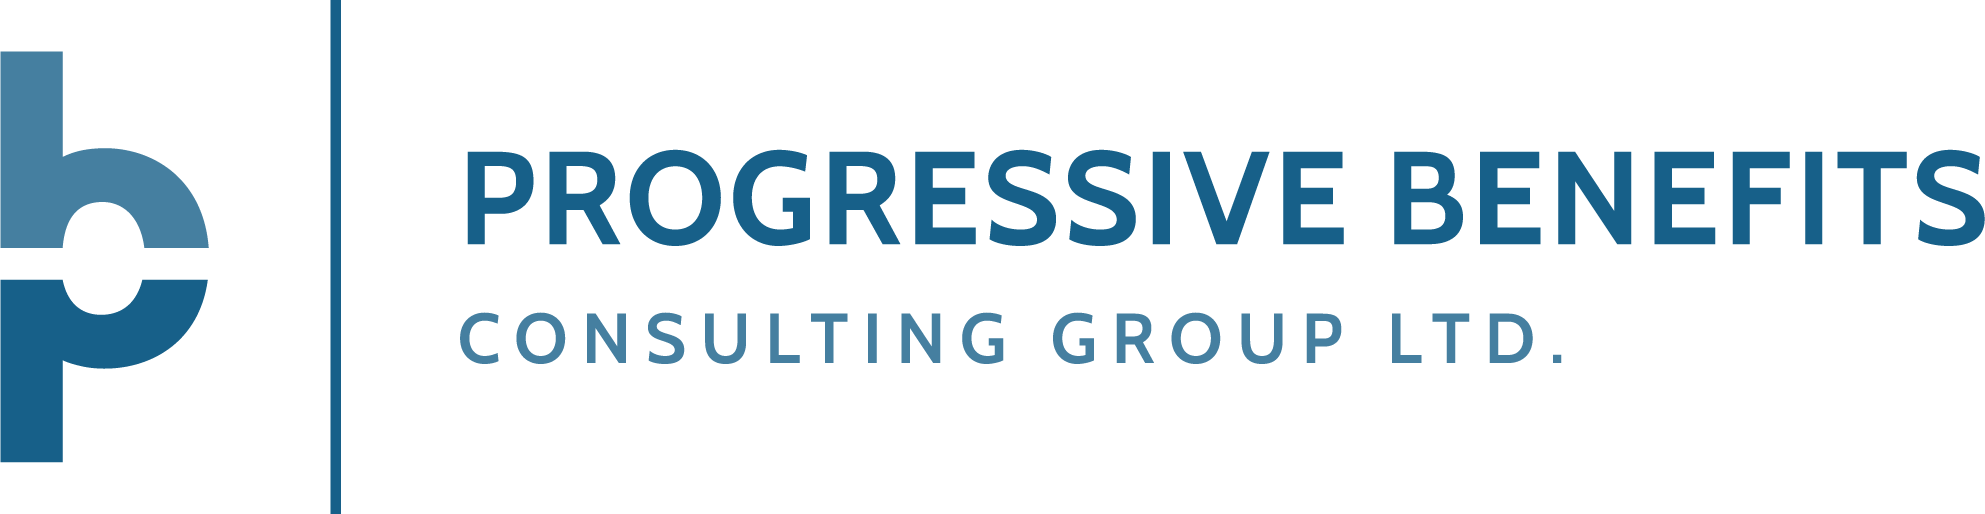 Progressive Benefits